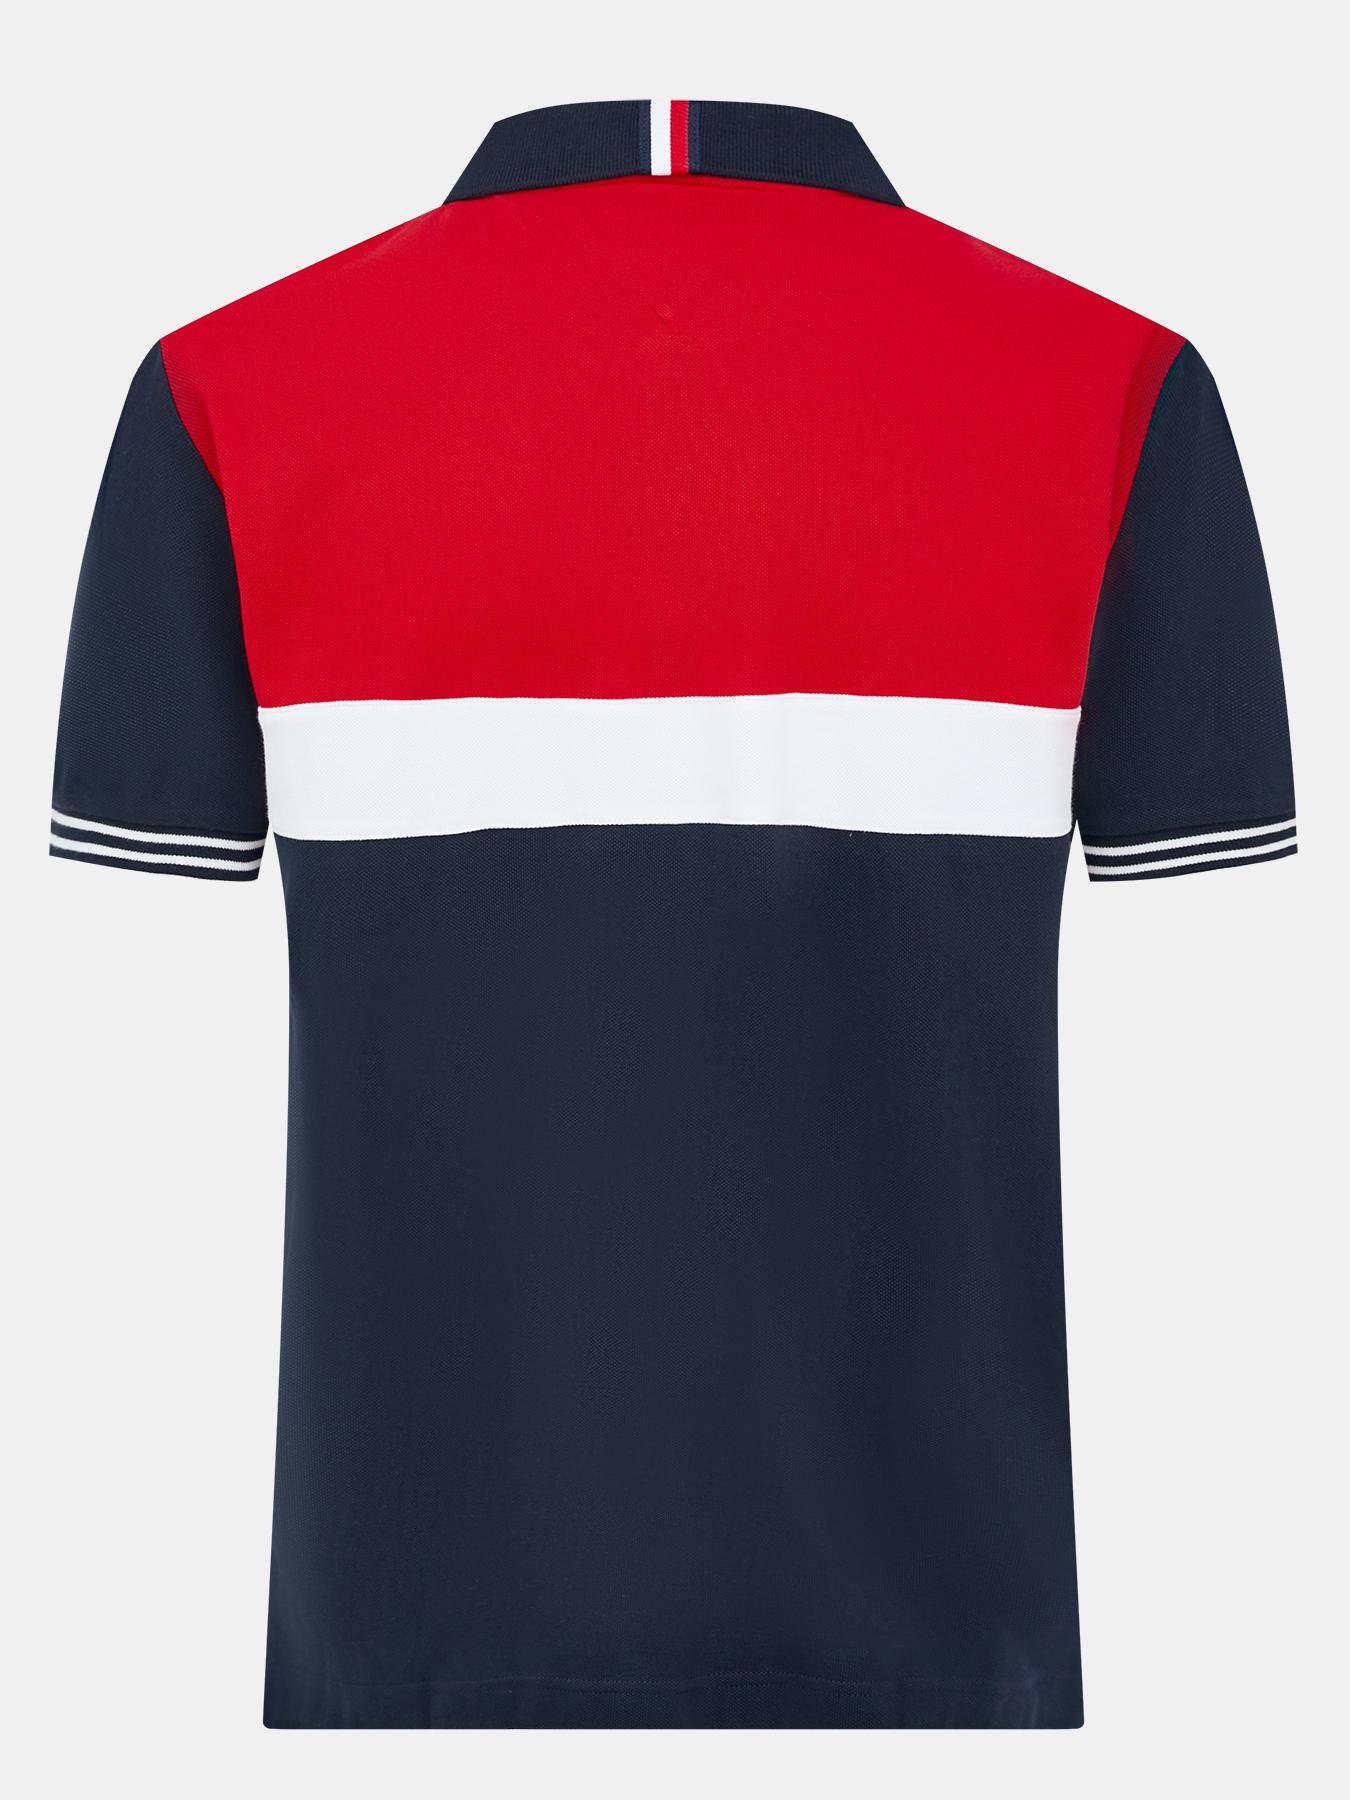 Рубашка поло Tommy Hilfiger Поло